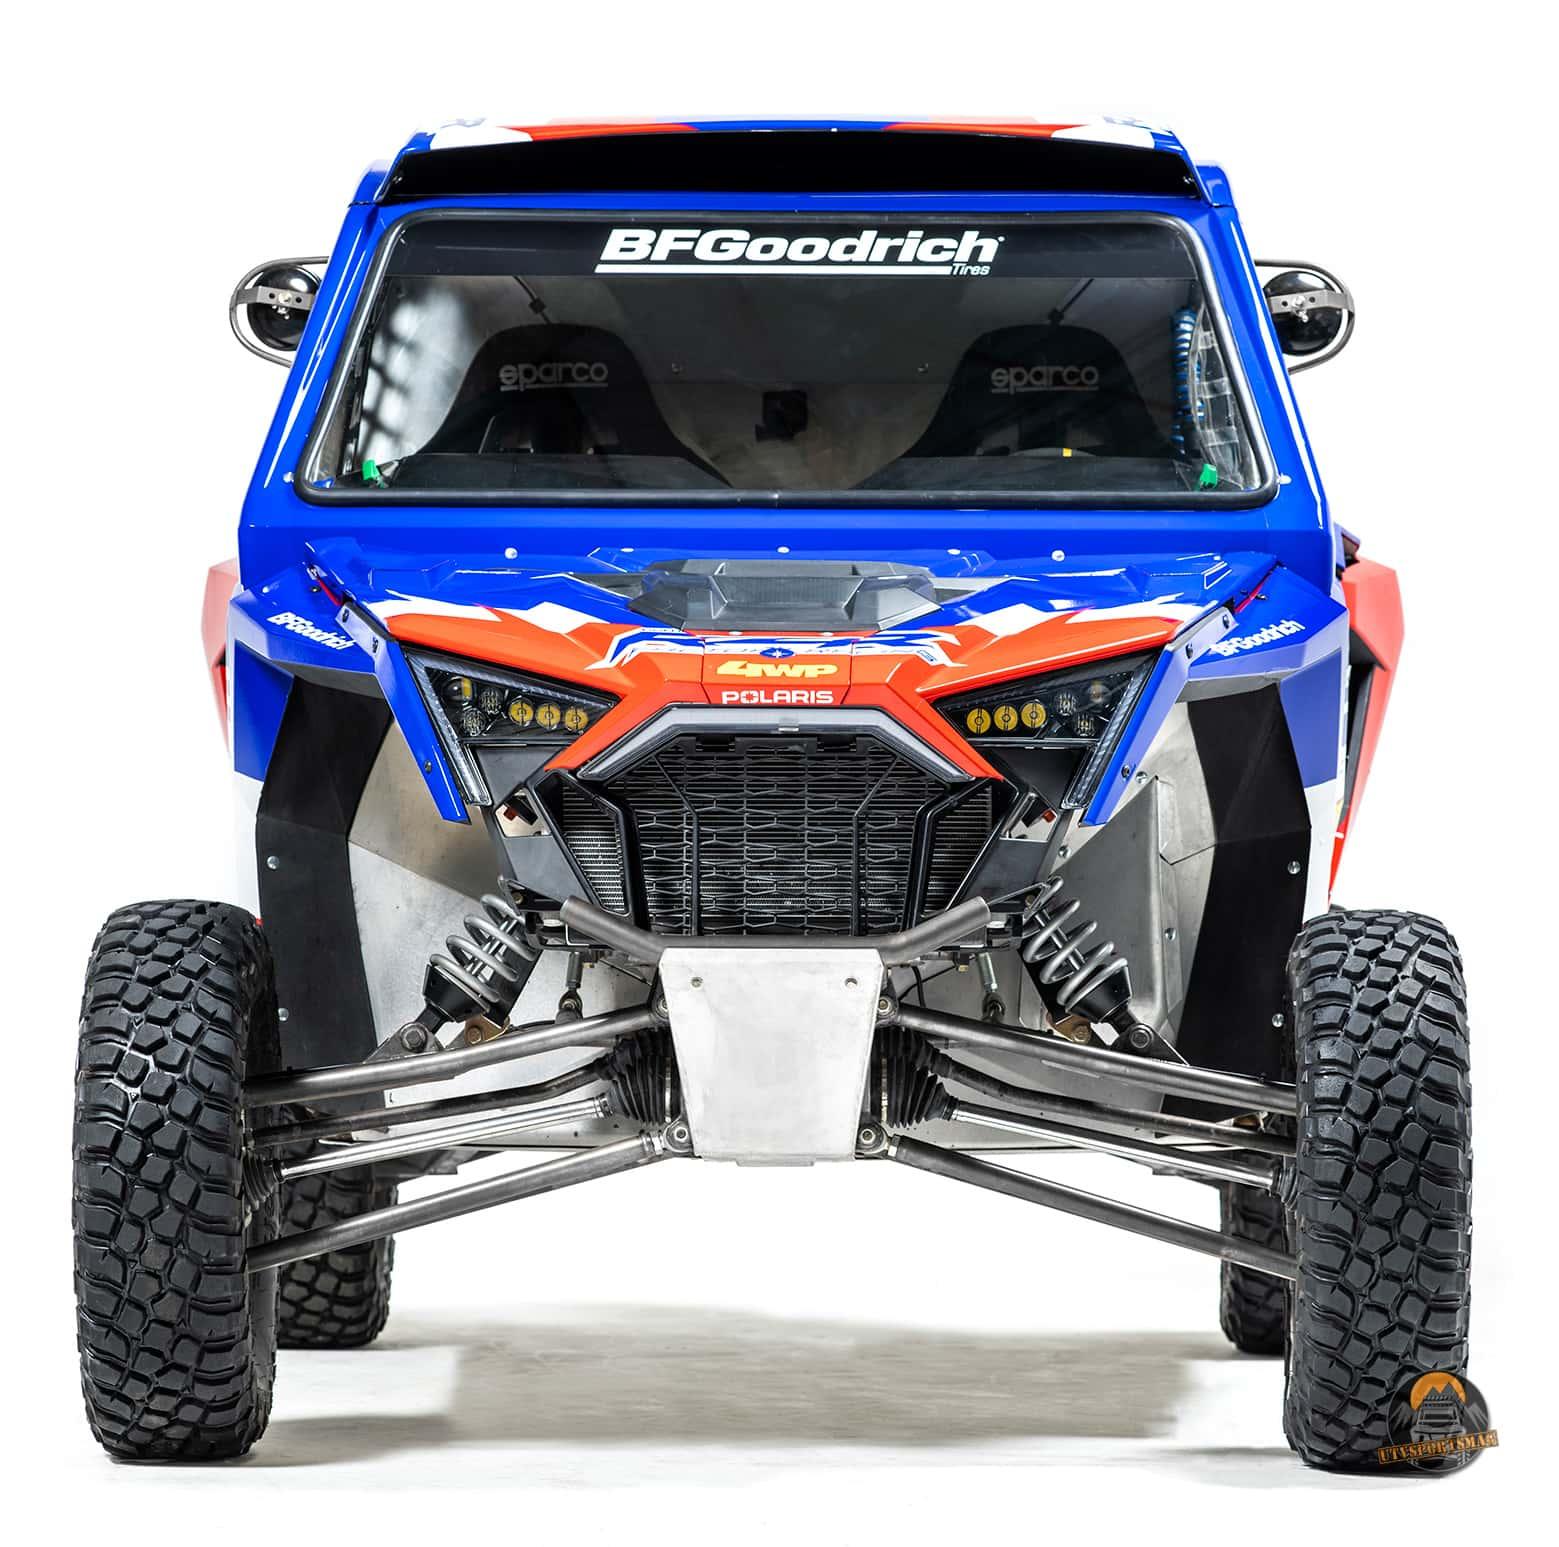 Polaris Dakar Vehicle Reveal